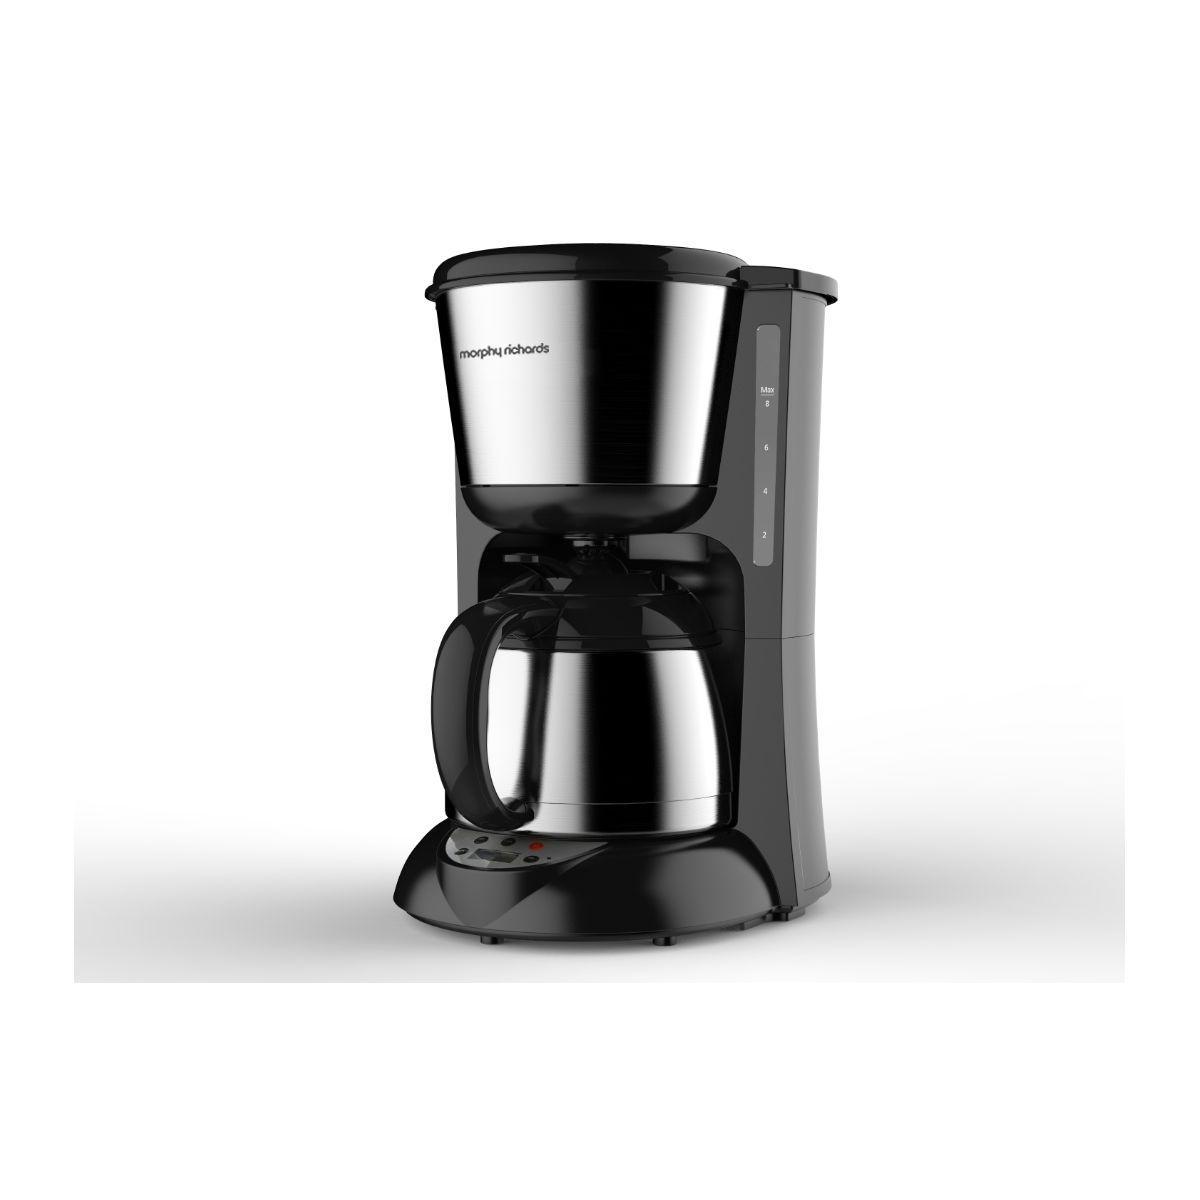 Cafeti�re isotherme morphy richards accents thermos prog. inox - 2% de remise imm�diate avec le code : deal2 (photo)